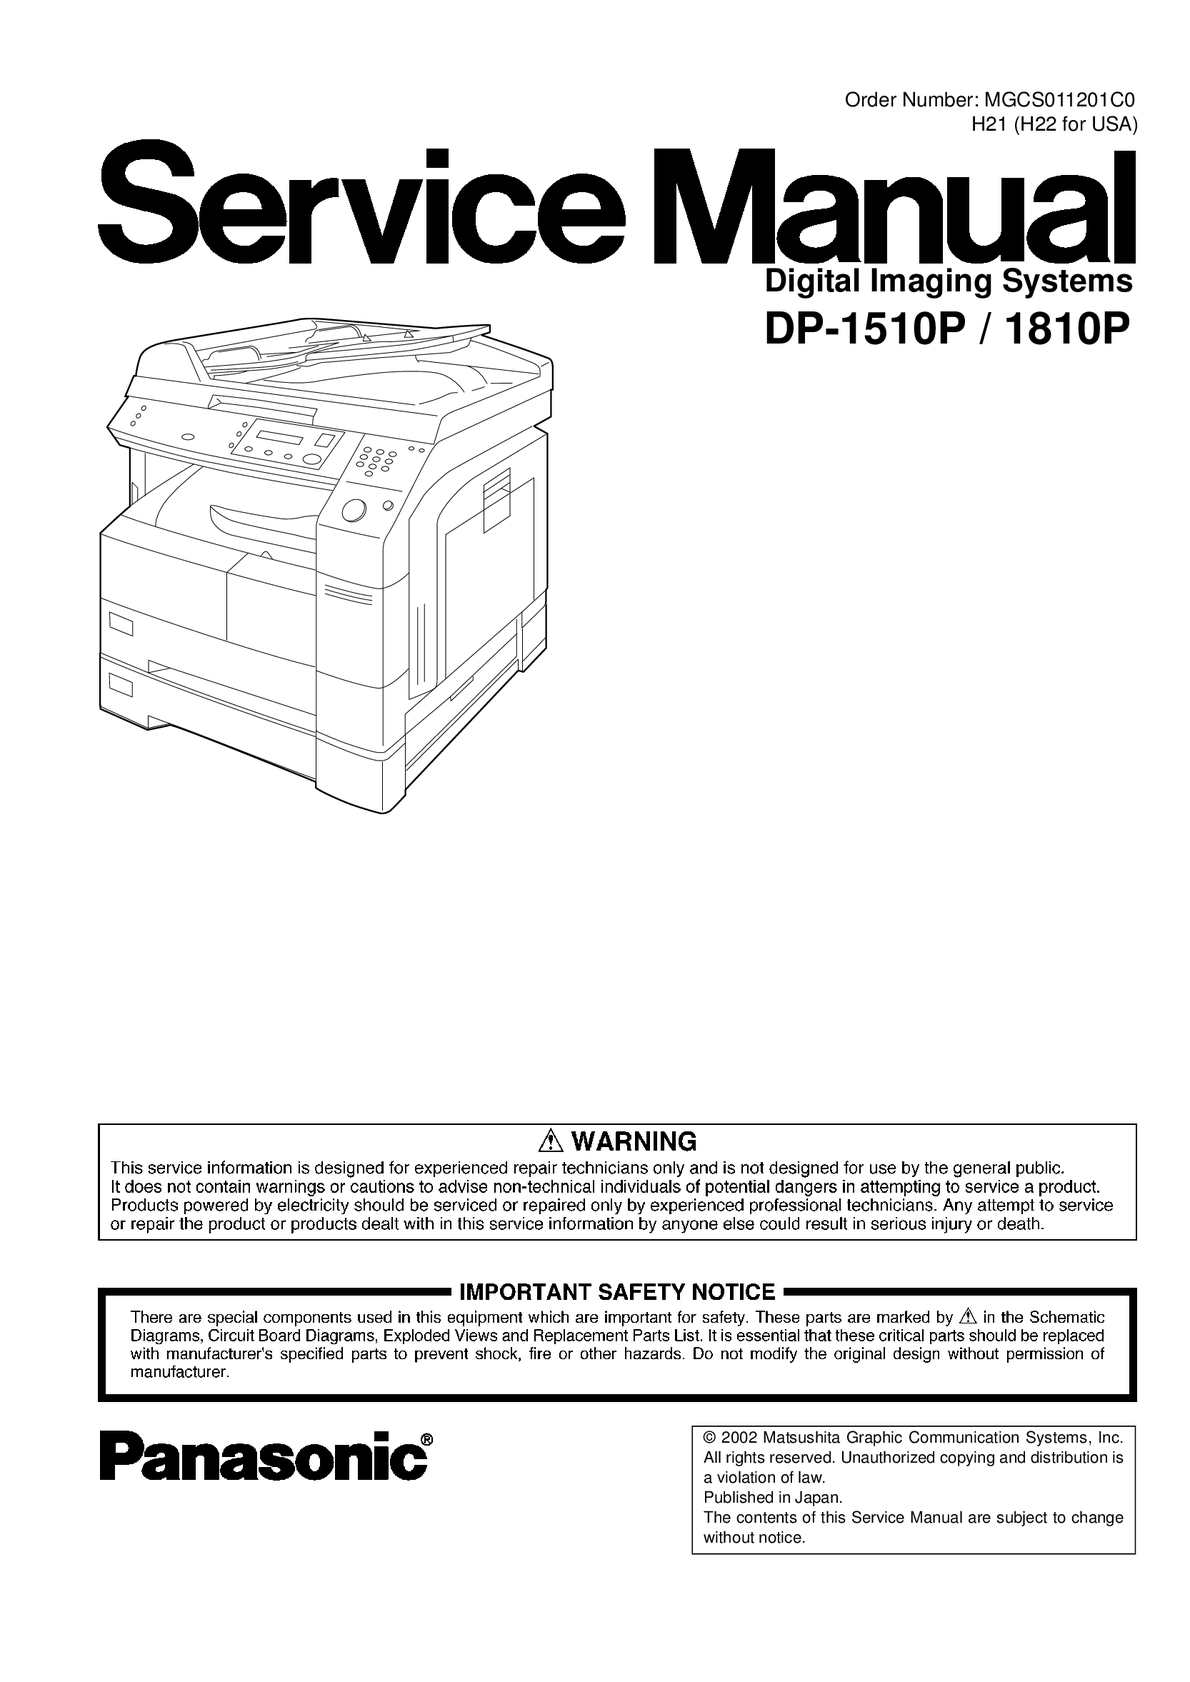 Calamo Panasonic Dp 1510 1810 Service Manual Speaker Protection Circuit 2pcb Schematic Delay